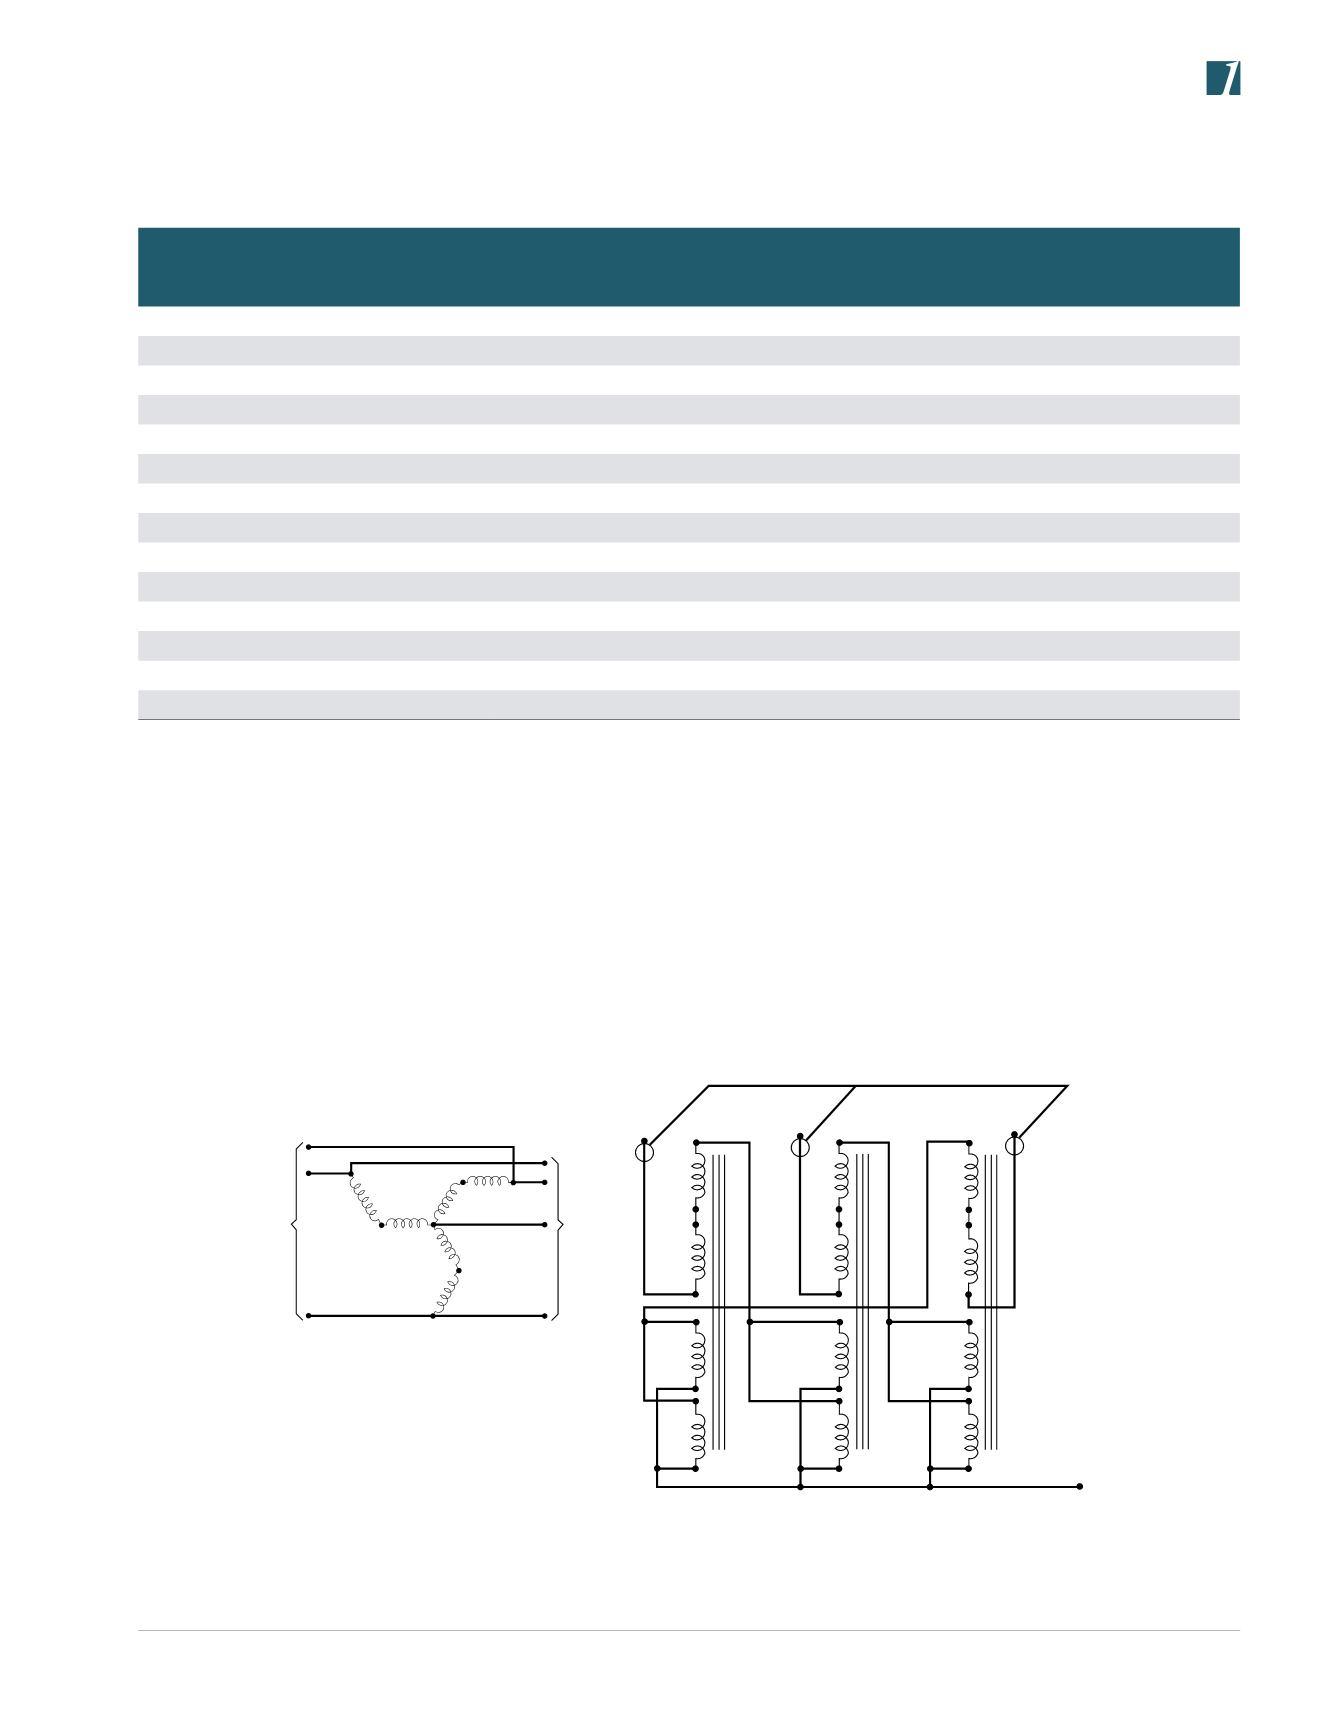 Acme Transformer Kva Wiring Diagram